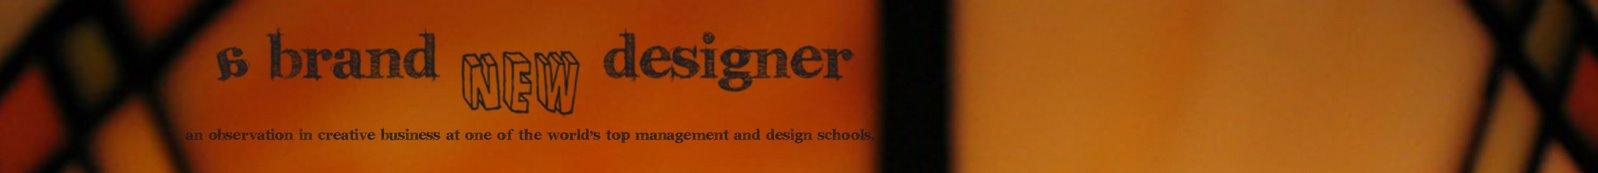 A BRAND new DESIGNER